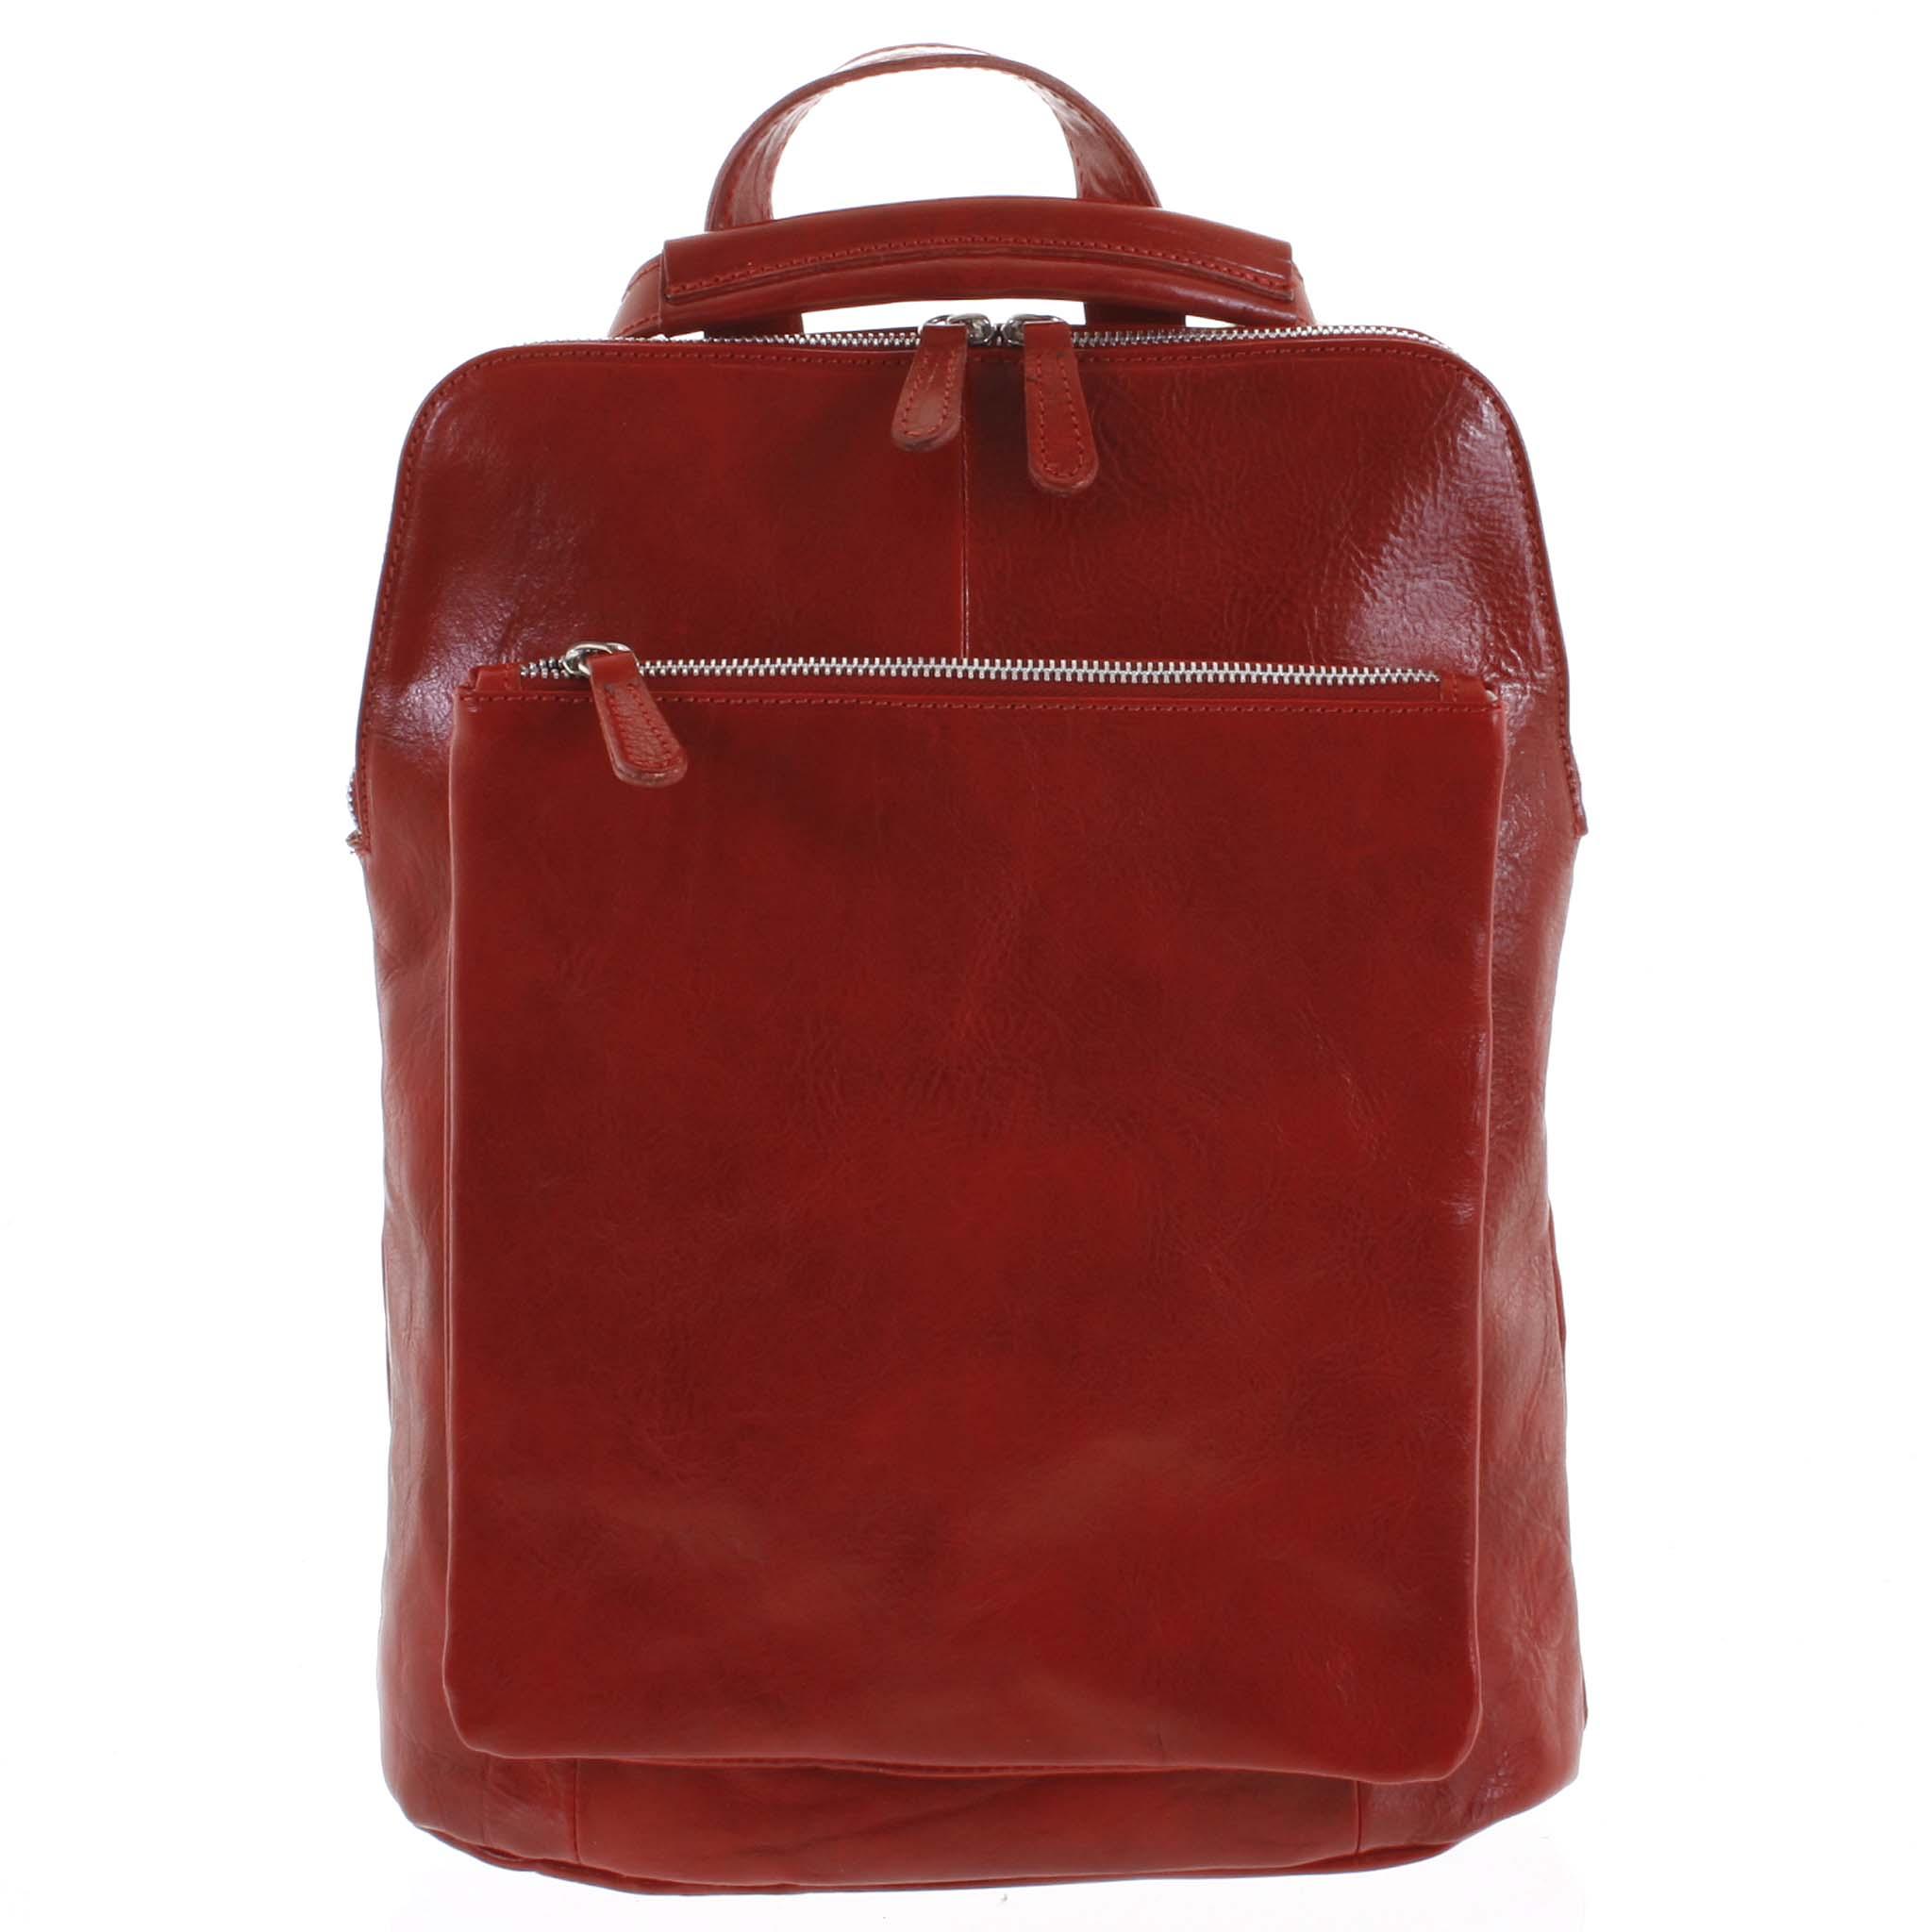 Dámsky kožený batoh kabelka červený - ItalY Englidis